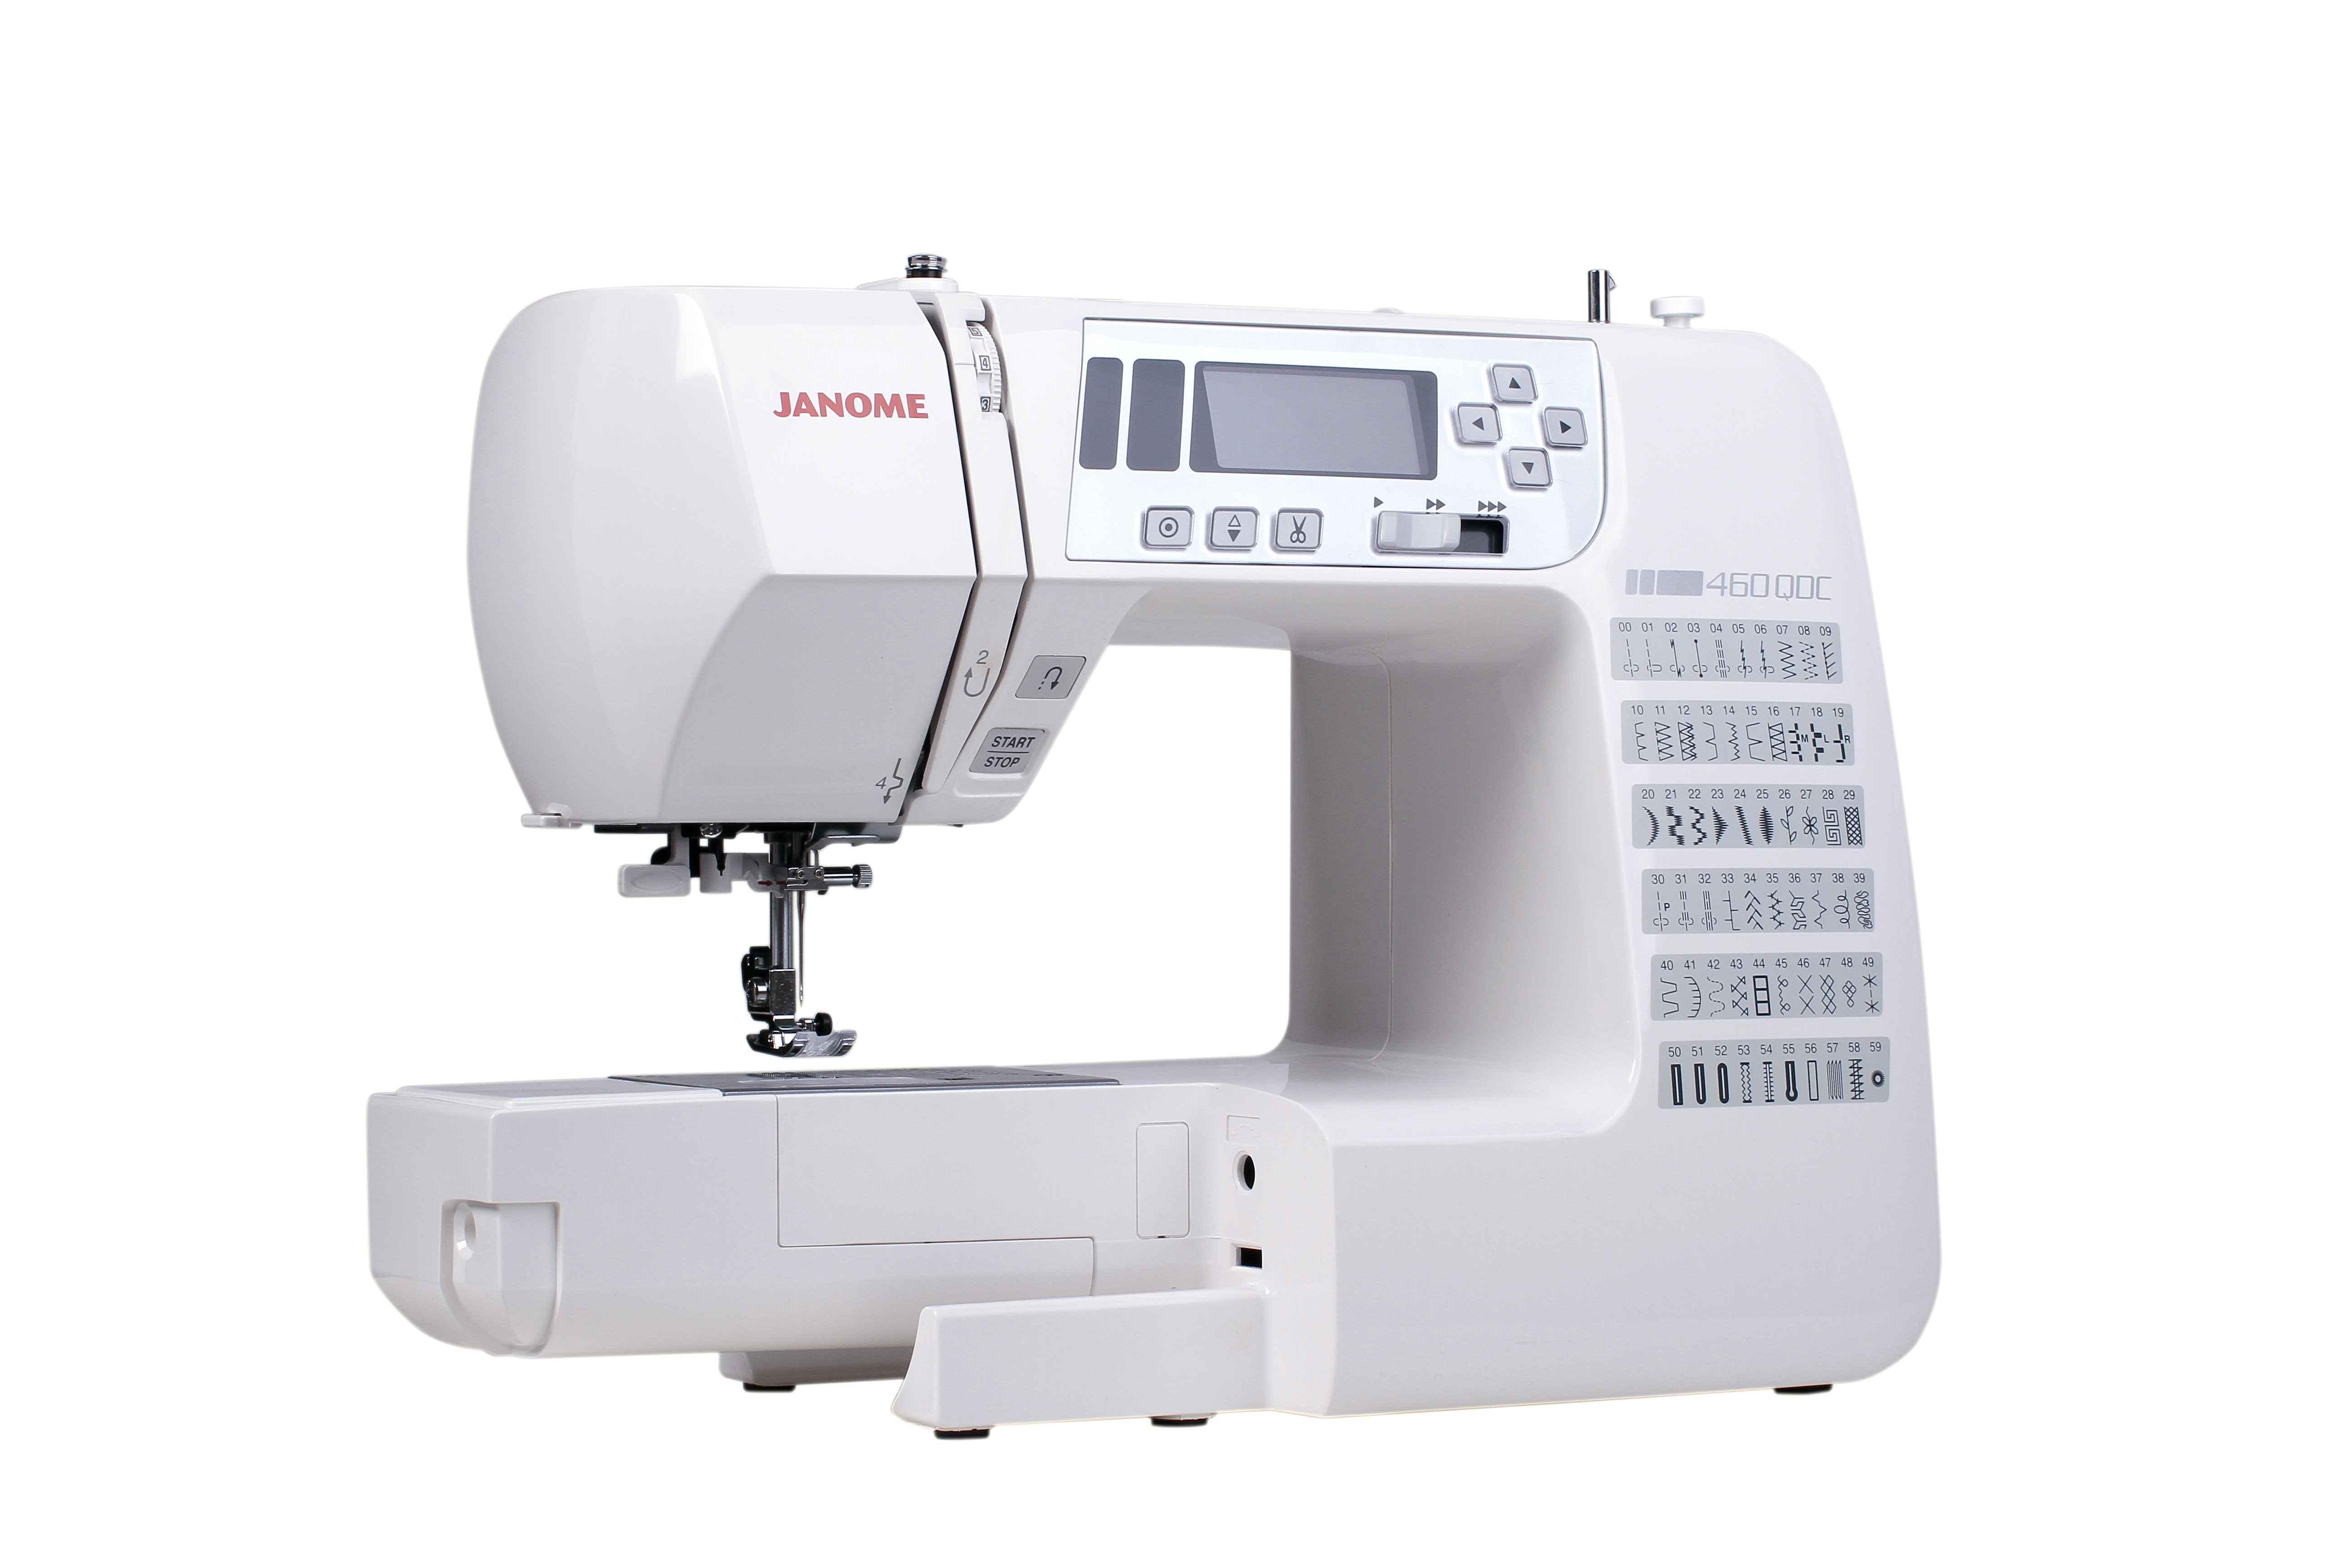 Швейная машина Janome 460 QDC швейная машина janome 460 qdc